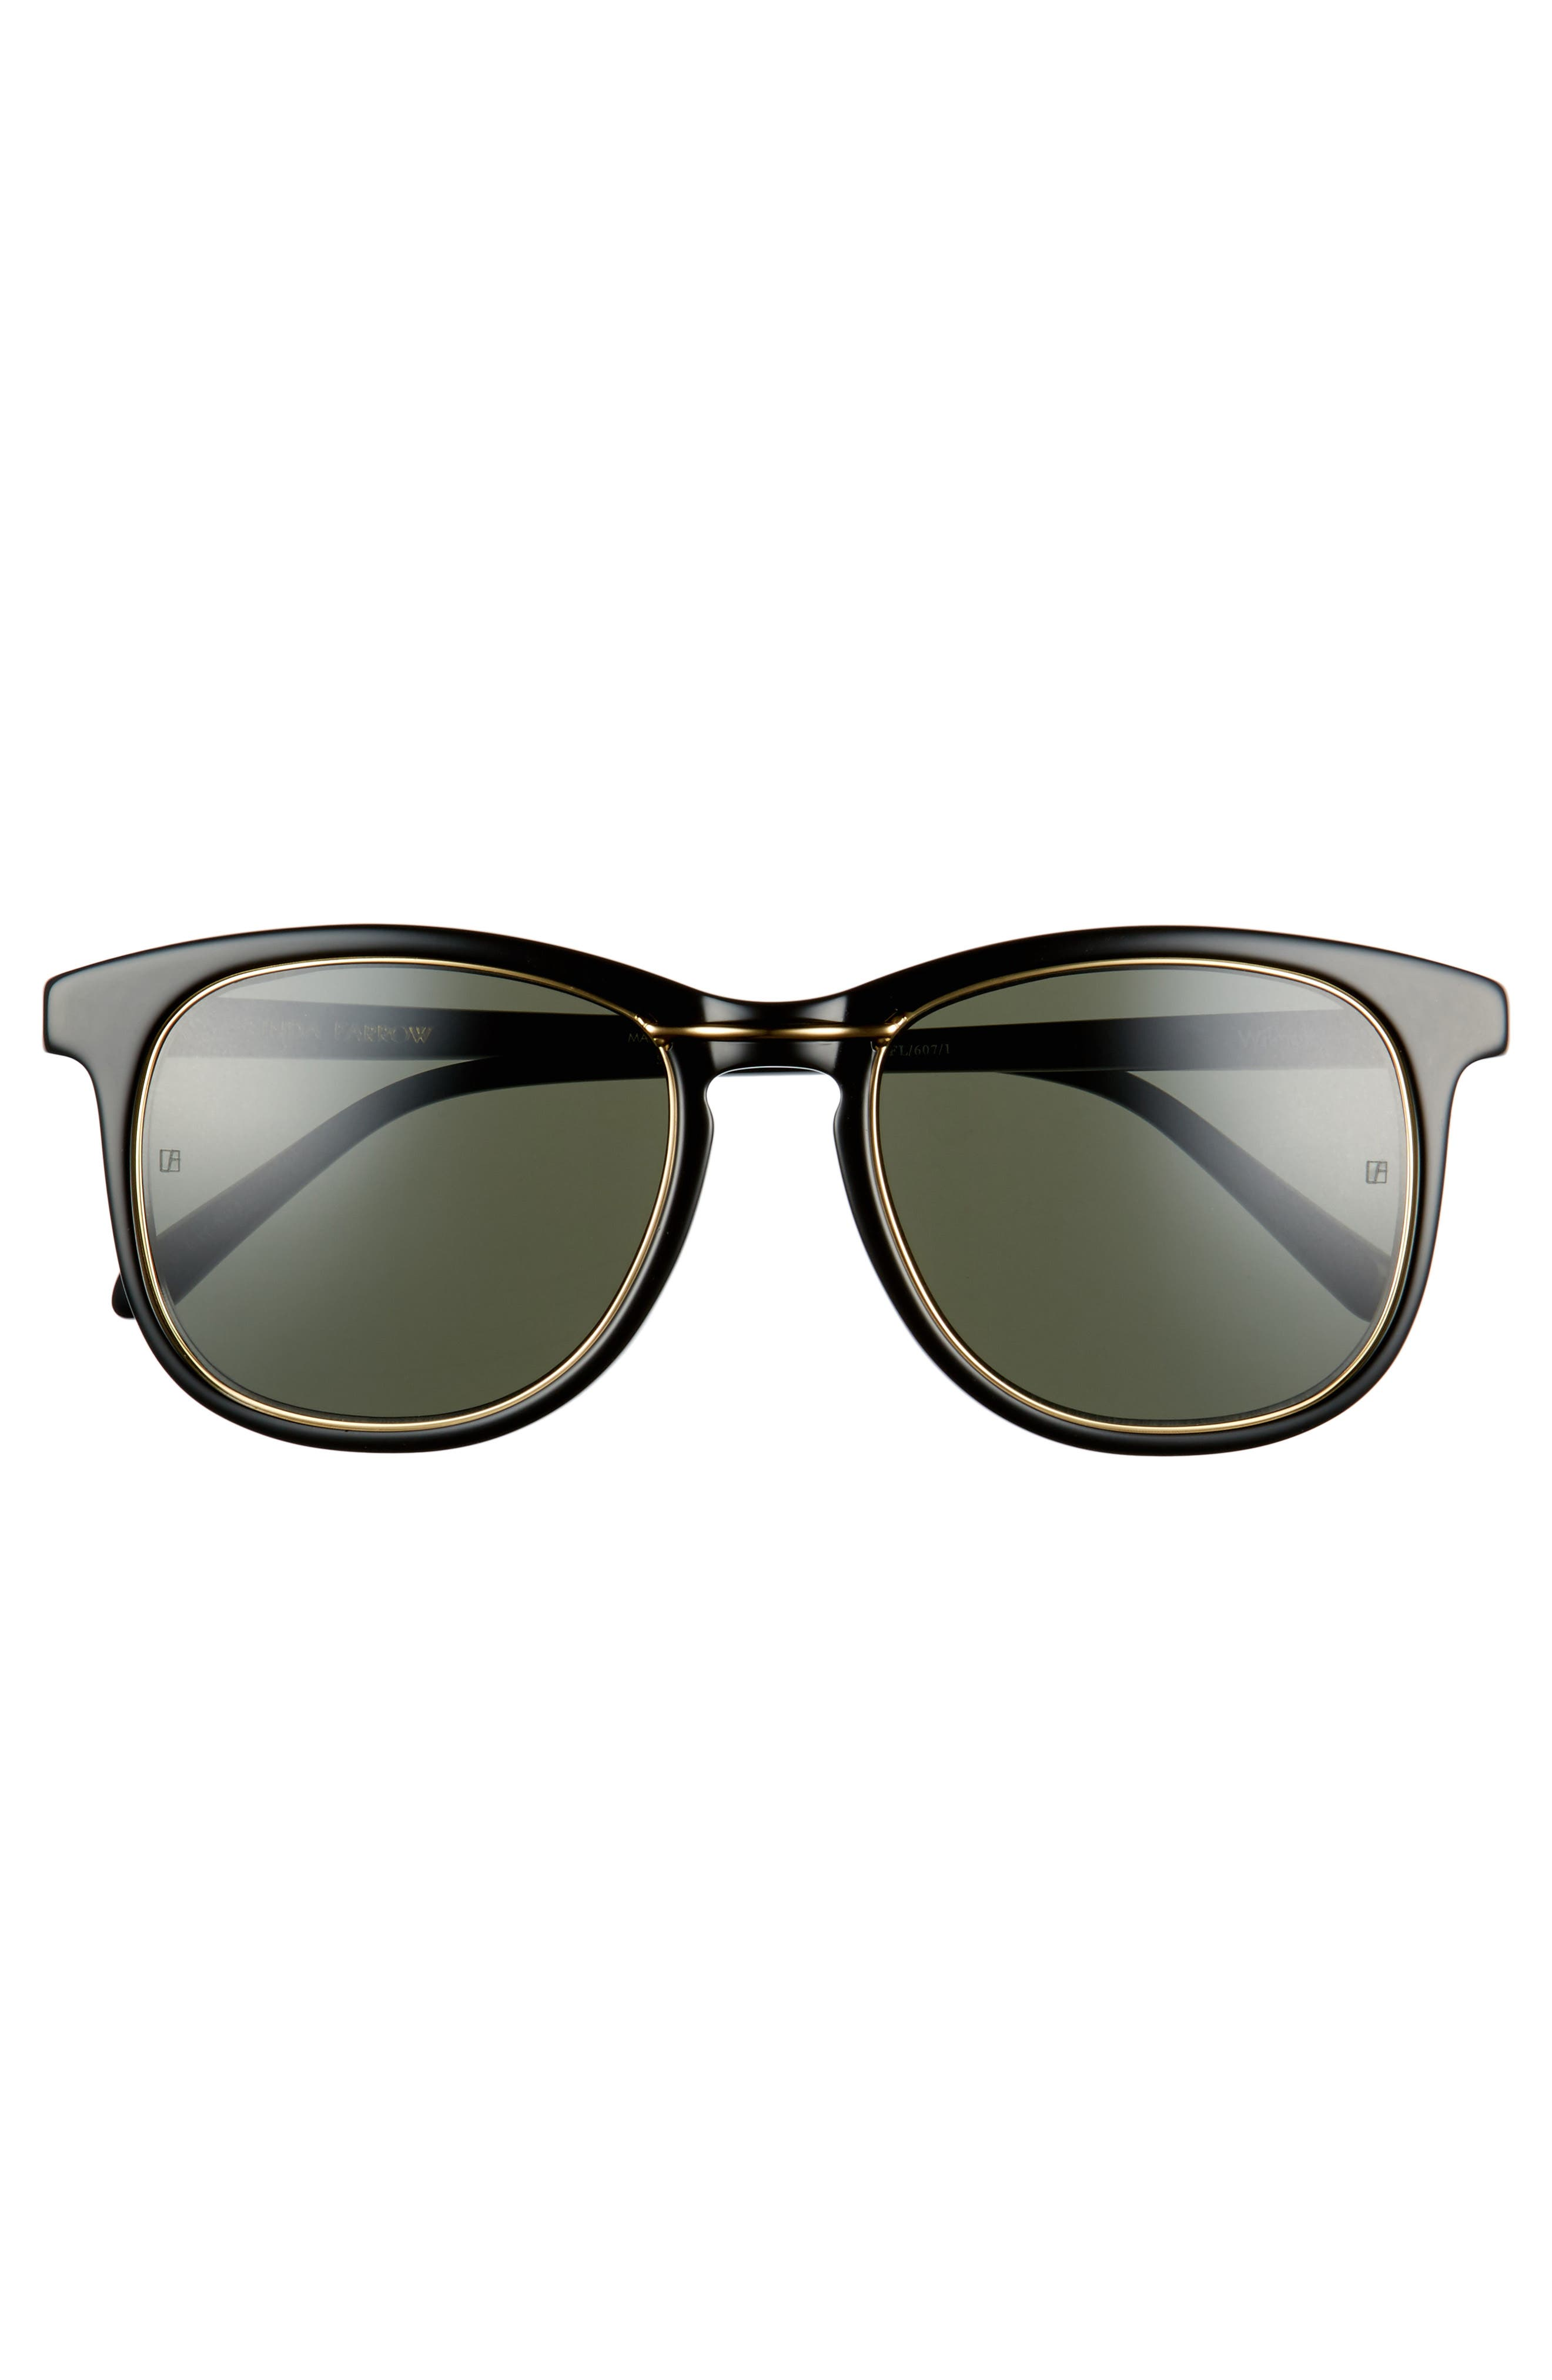 53mm Sunglasses,                             Alternate thumbnail 2, color,                             Wilmott Black/ Yellow Gold